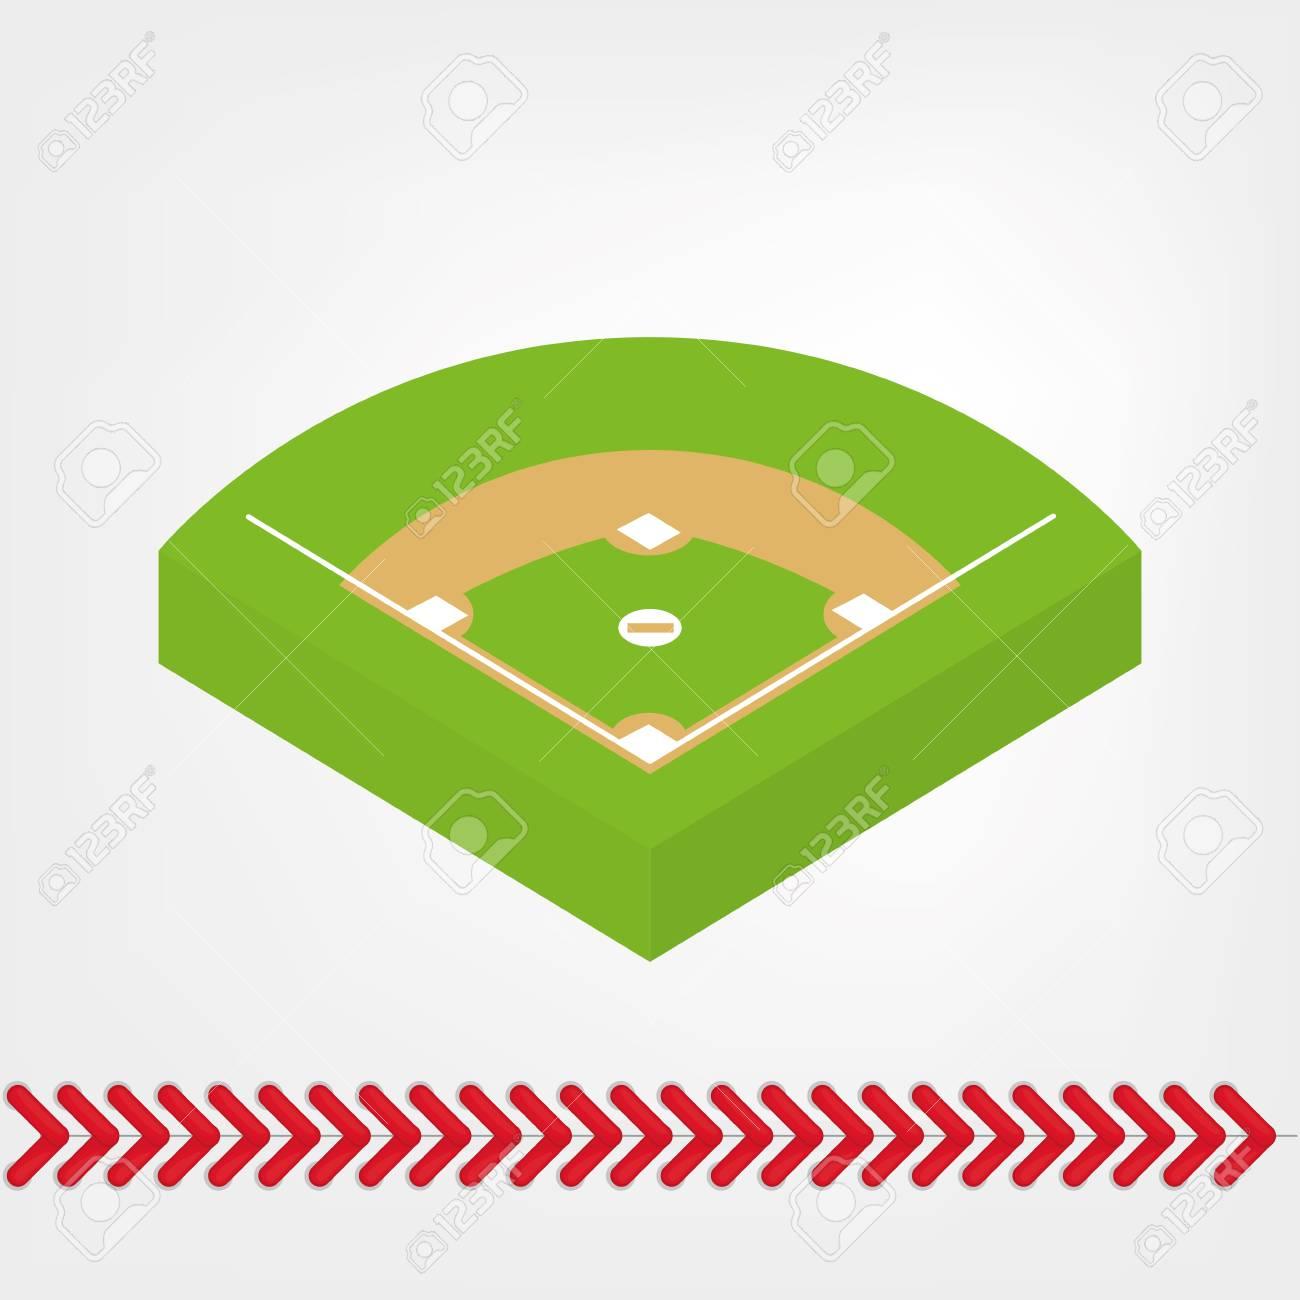 baseball stadium clipart at getdrawings com free for personal use rh getdrawings com